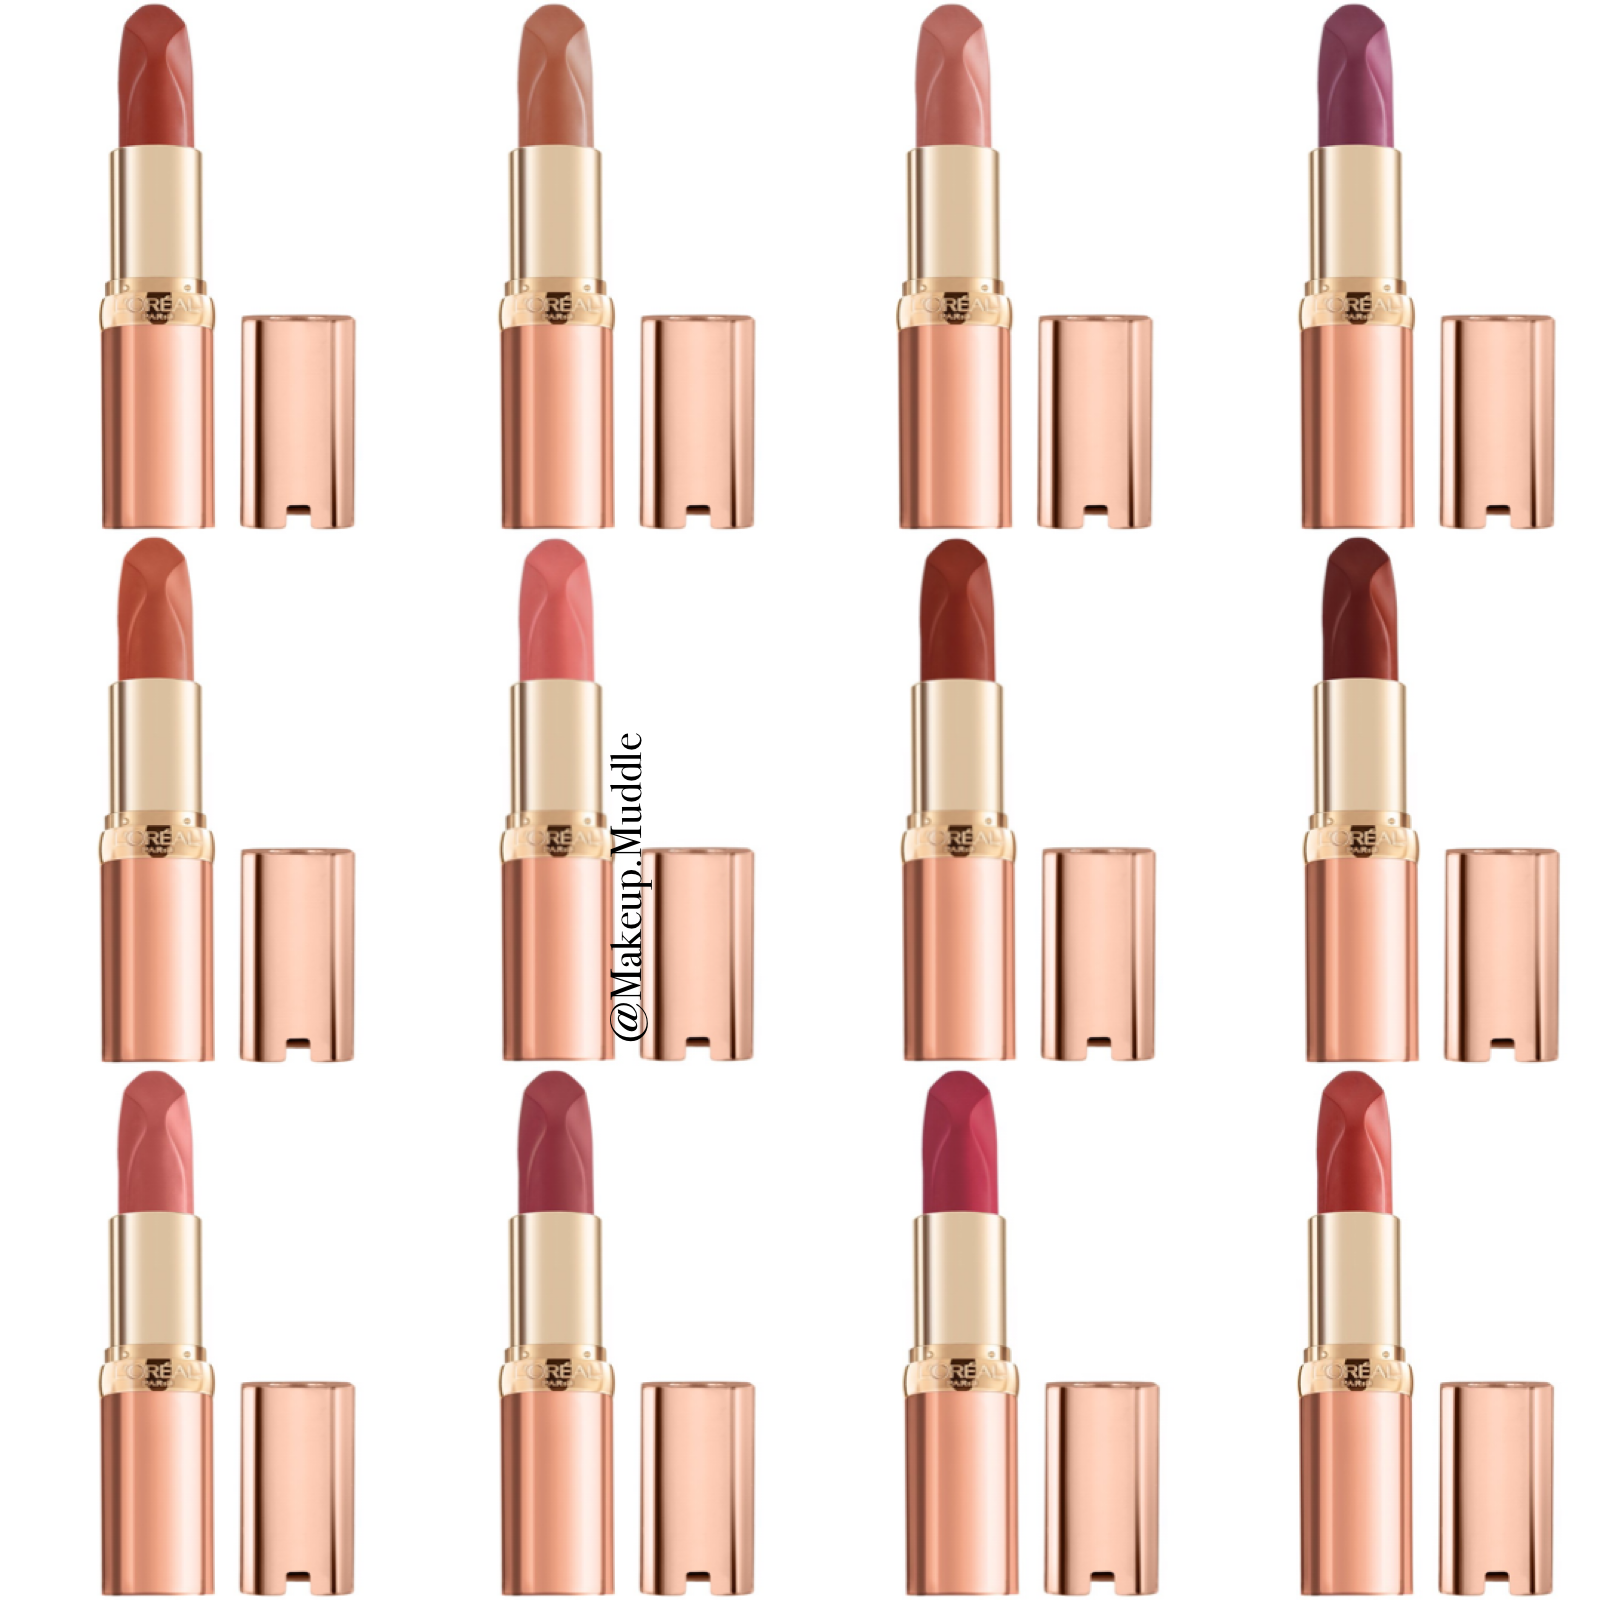 L'Oreal Colour Riche Les Nus Intense Lipstick Collection